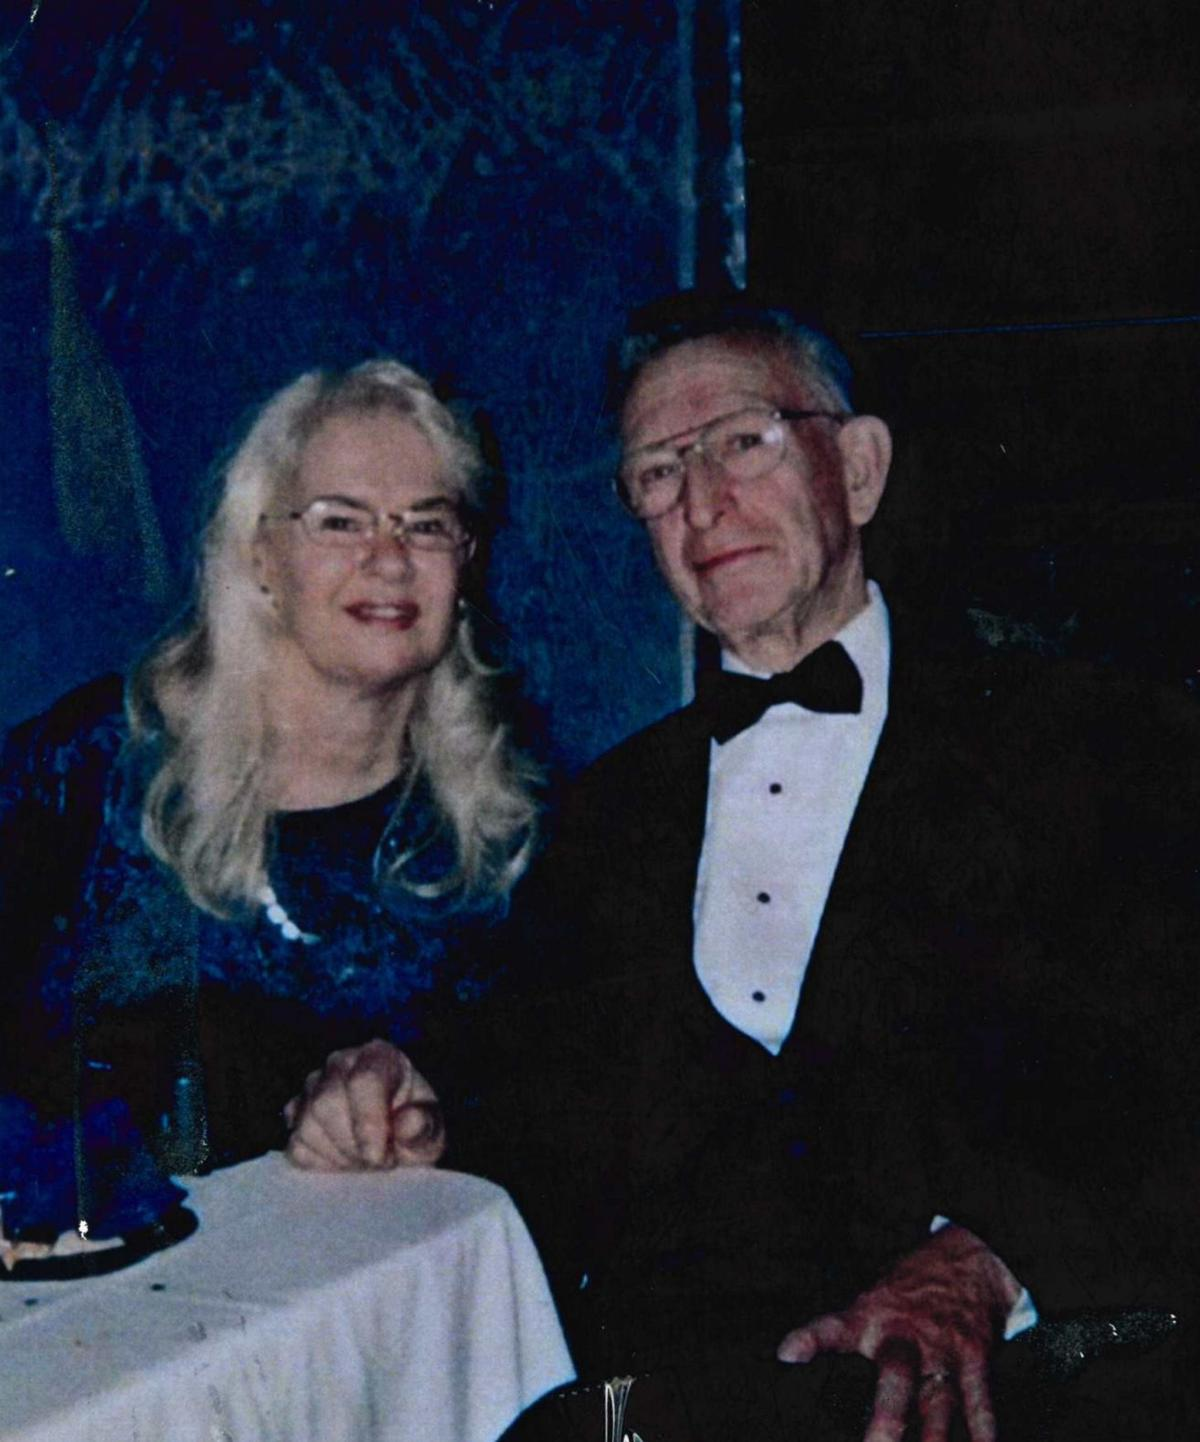 Sheila A. and Kenneth G. Drew Sr., 49 years